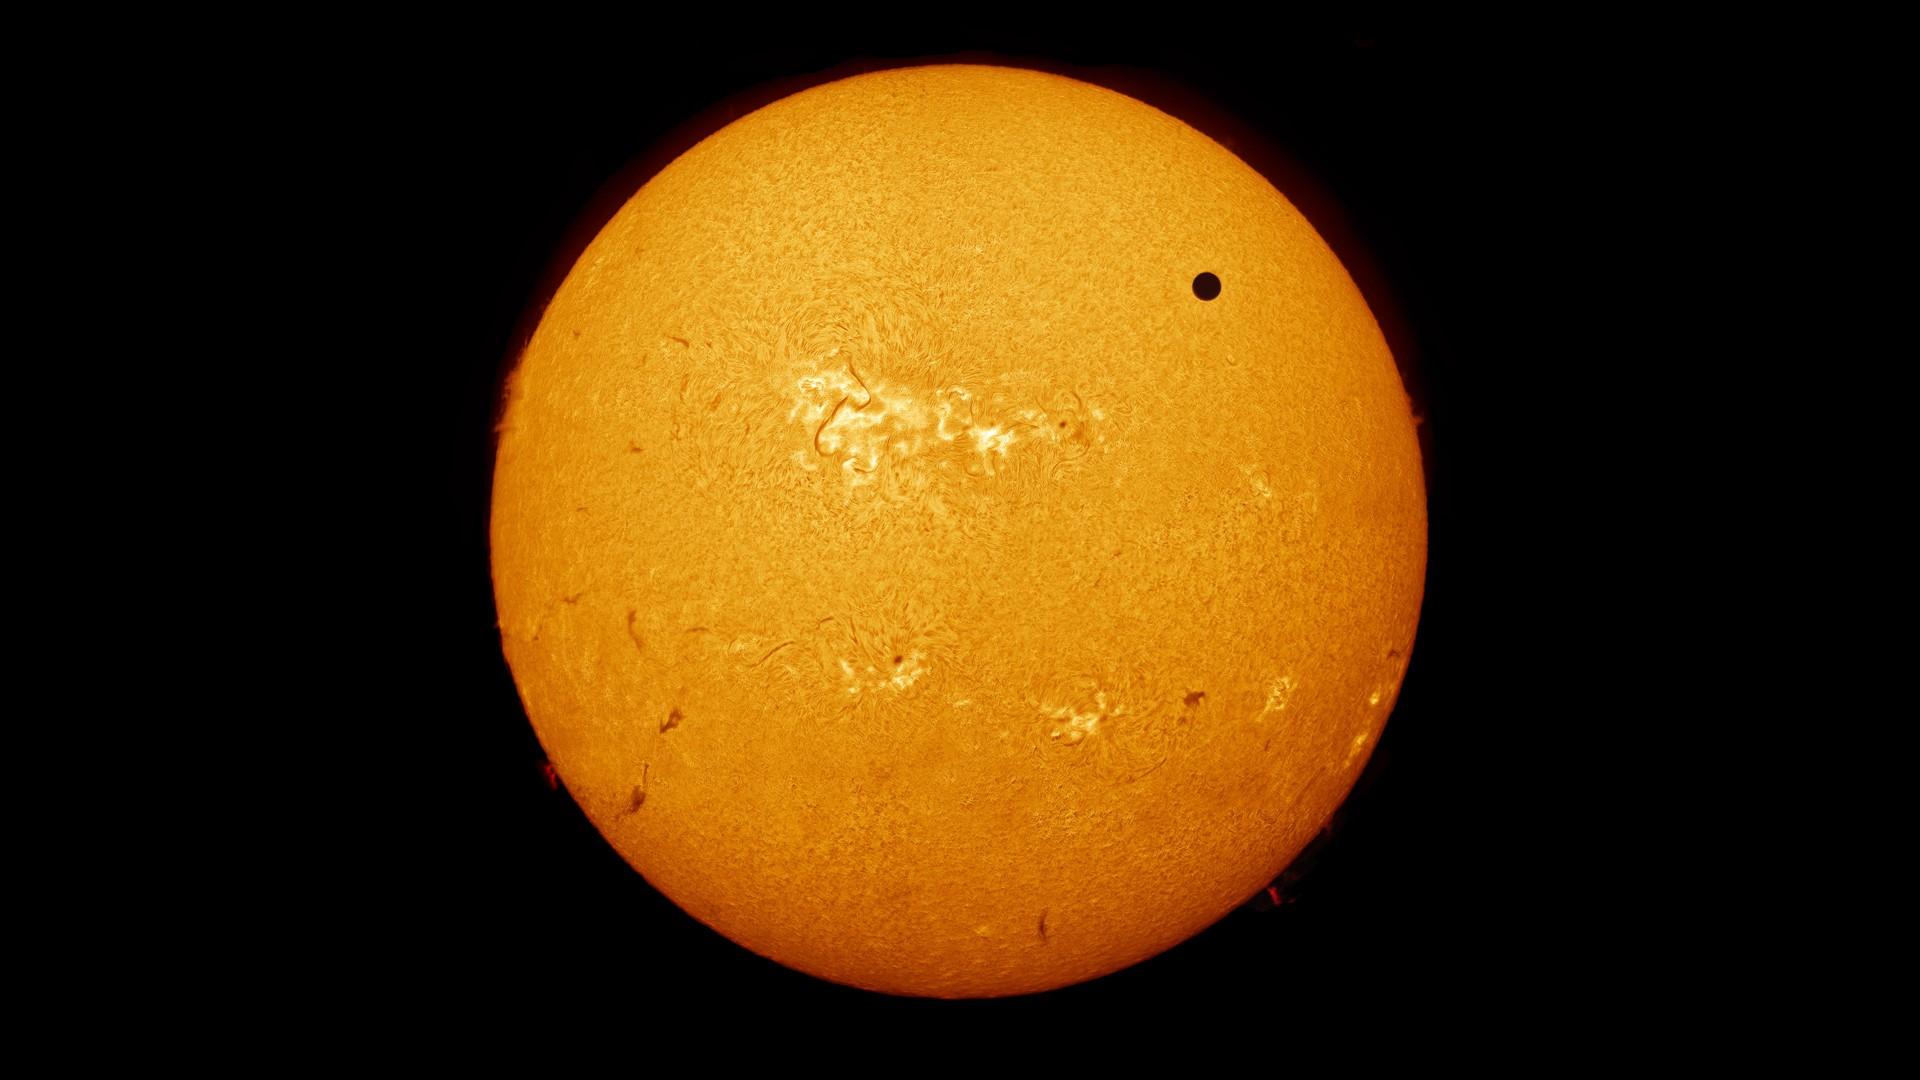 General 1920x1080 space Sun Venus astronomy orange